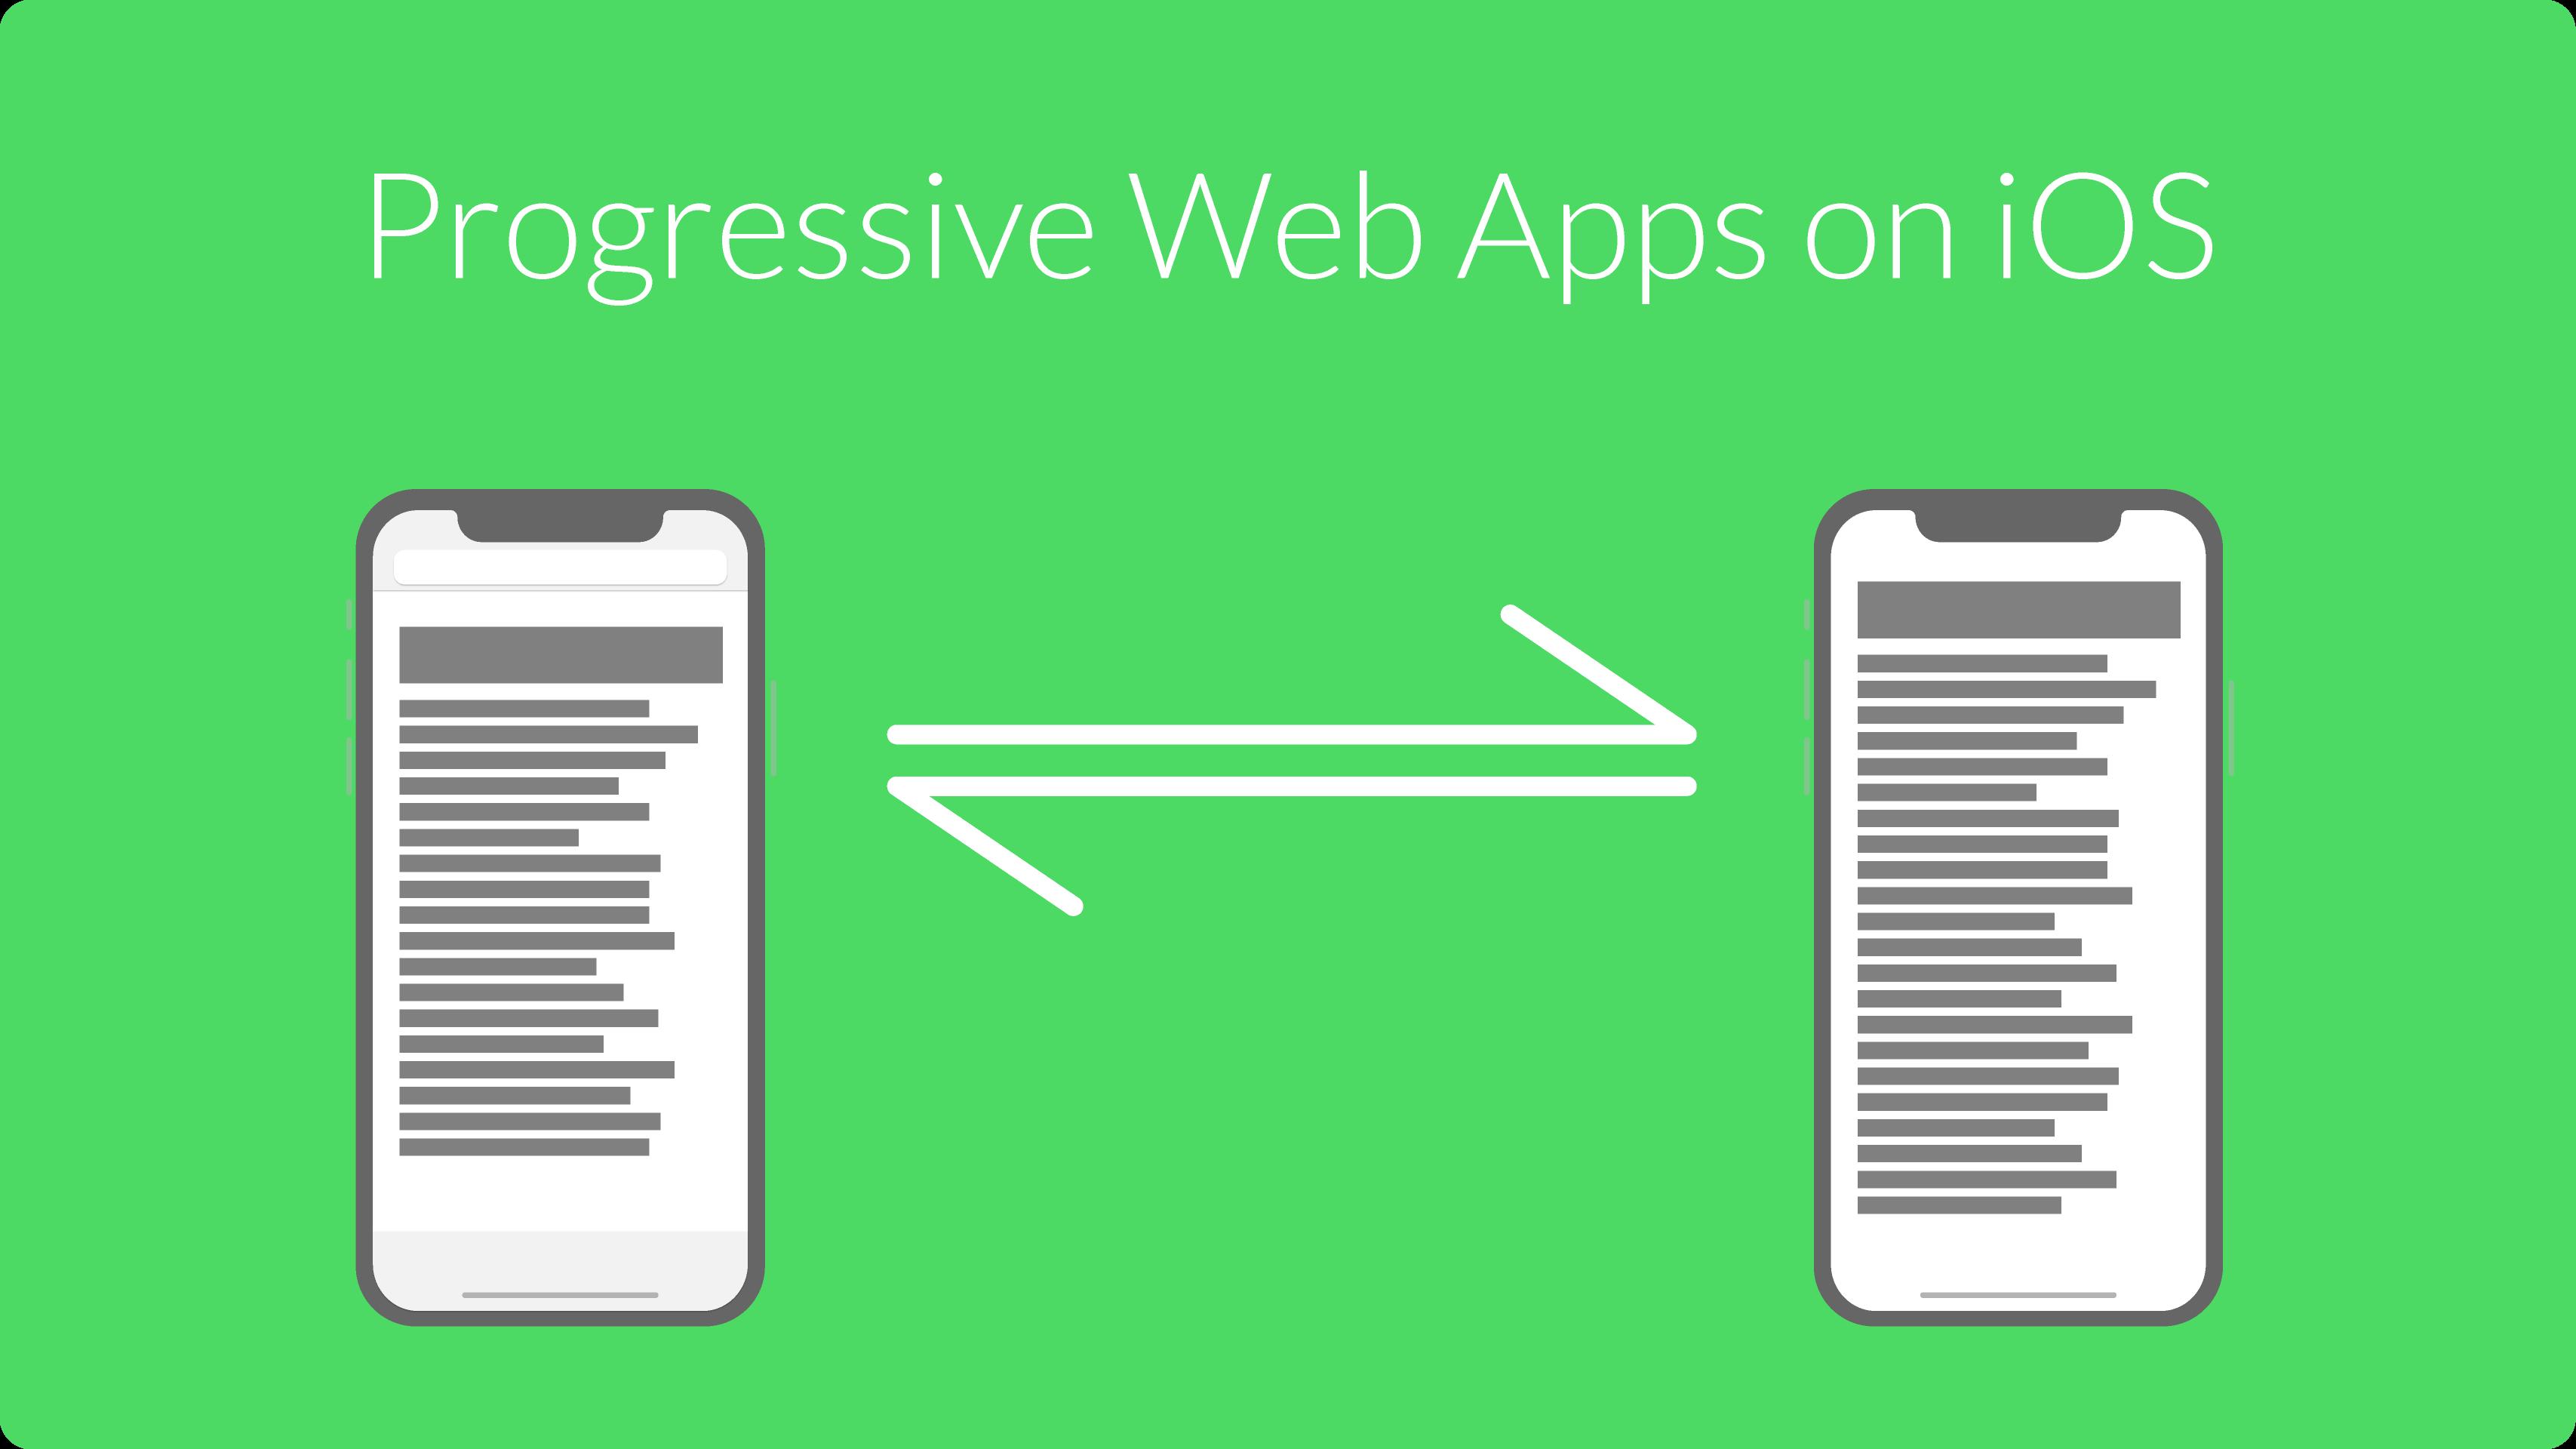 Progressive Web Apps on iOS – Headerbild zum Blogartikel